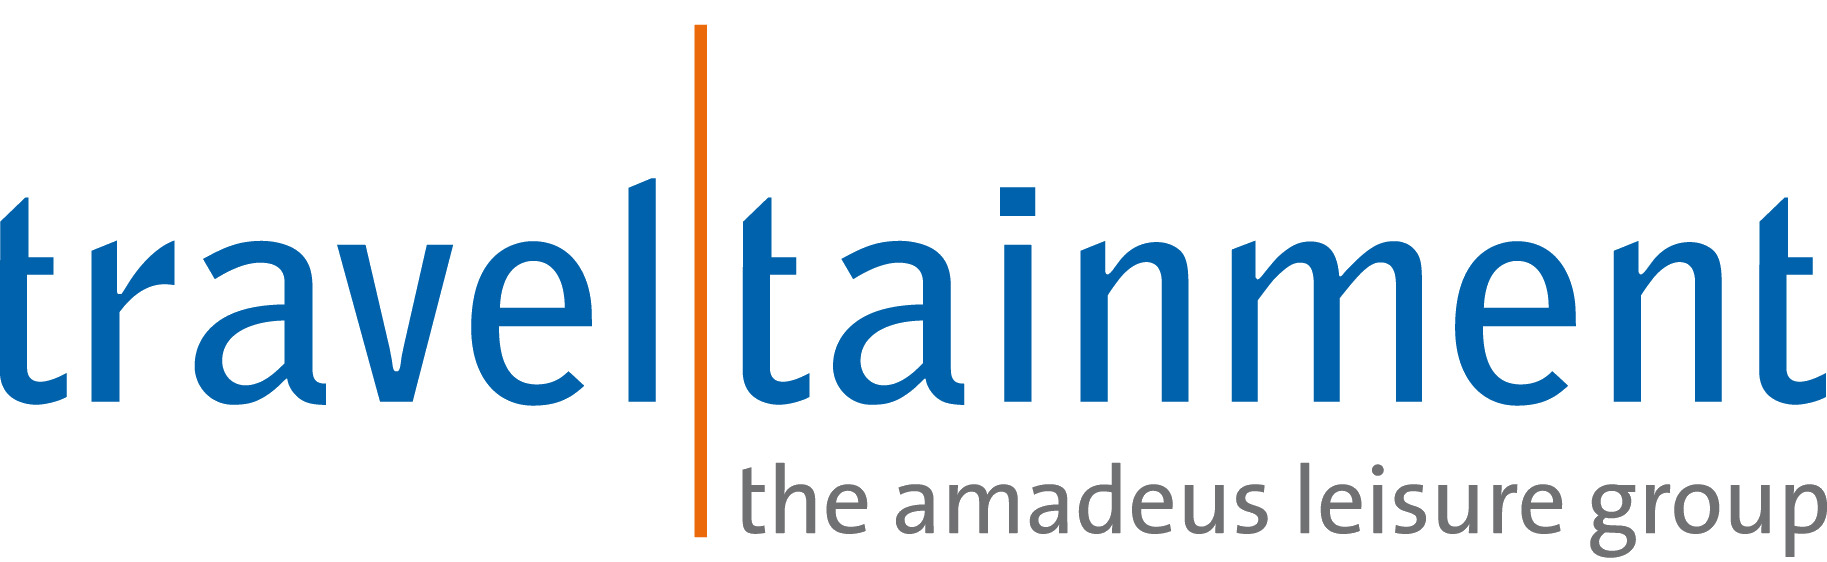 traveltainment logo alt